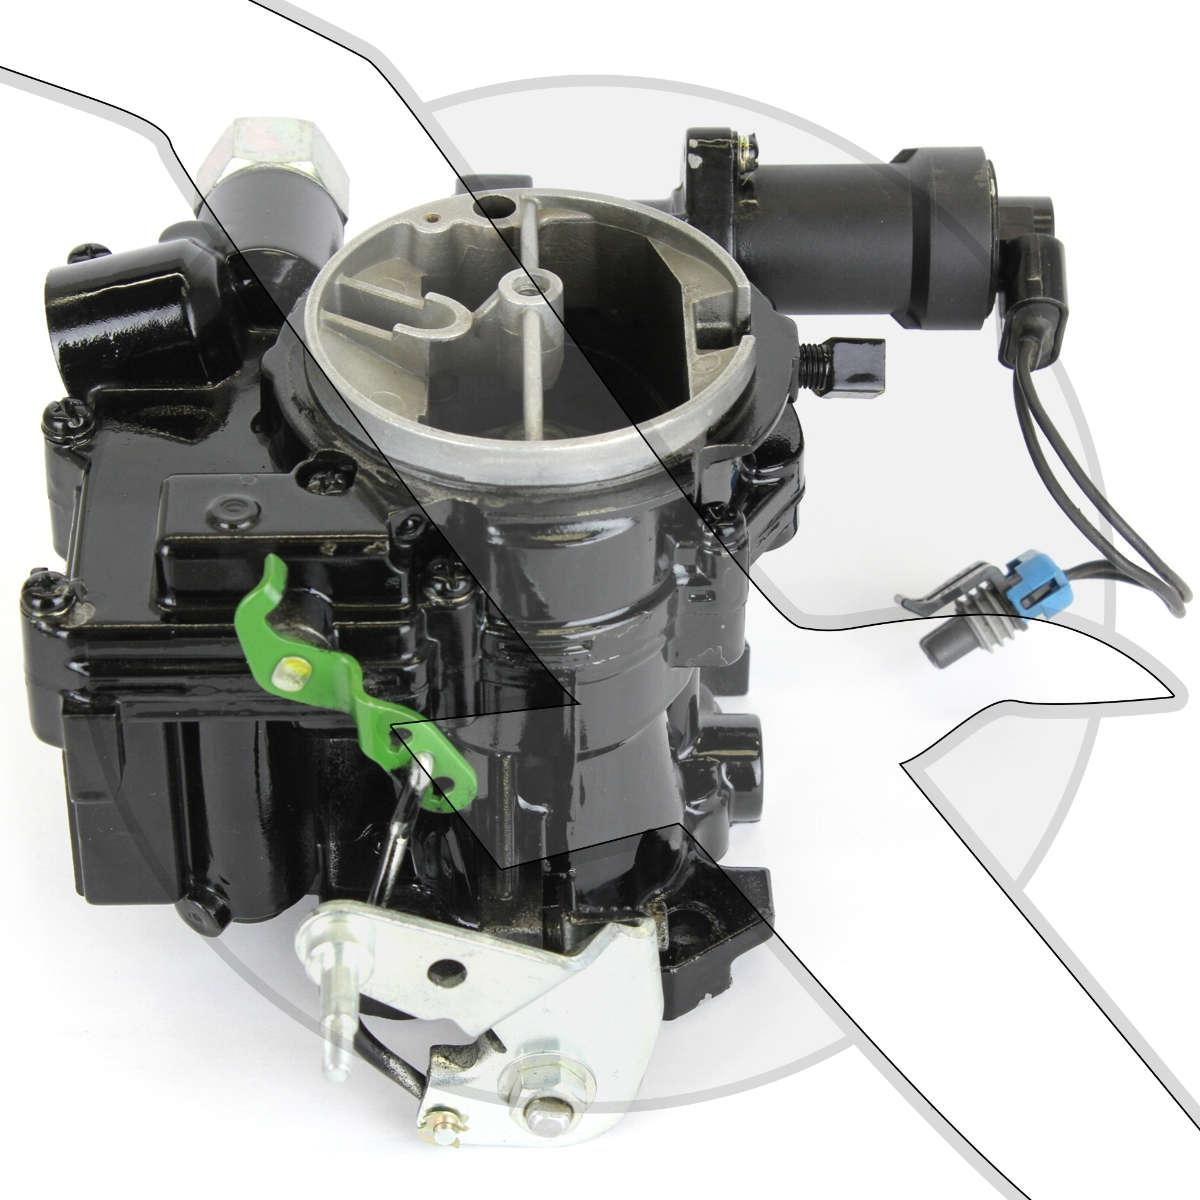 Mercruiser 30 Tks Wiring Schematic Manual Of Diagram 4 3 Liter 0l Carburetor 3310 866140a02 8m0084193 866148 Rh Ebay Com